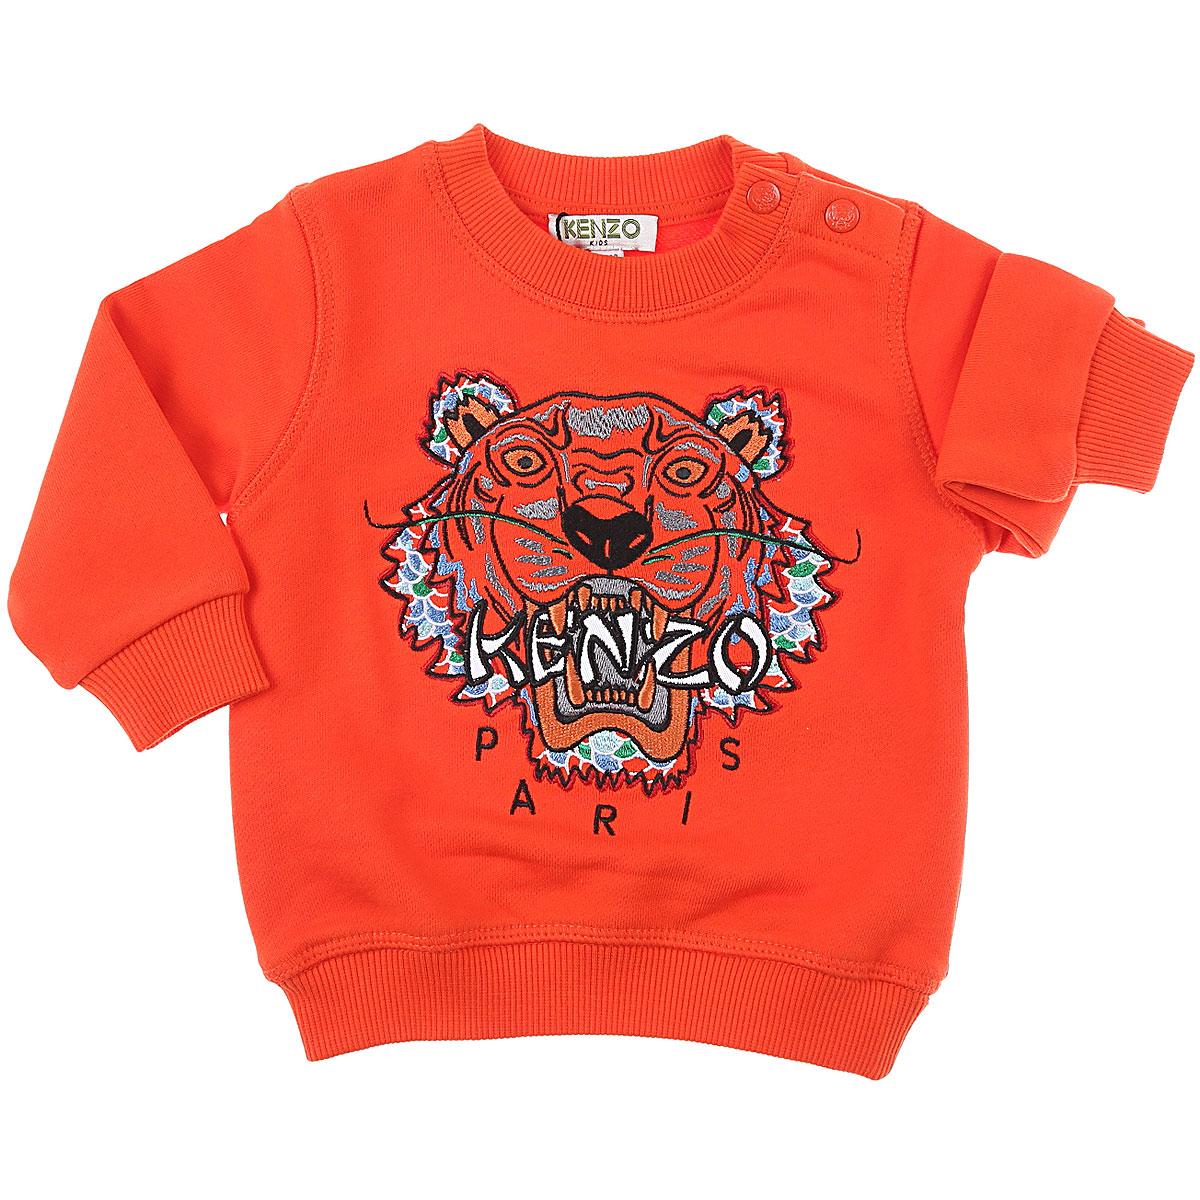 Kenzo Baby Sweatshirts & Hoodies for Boys On Sale, Orange, Cotton, 2019, 12 M 18M 6M 9M